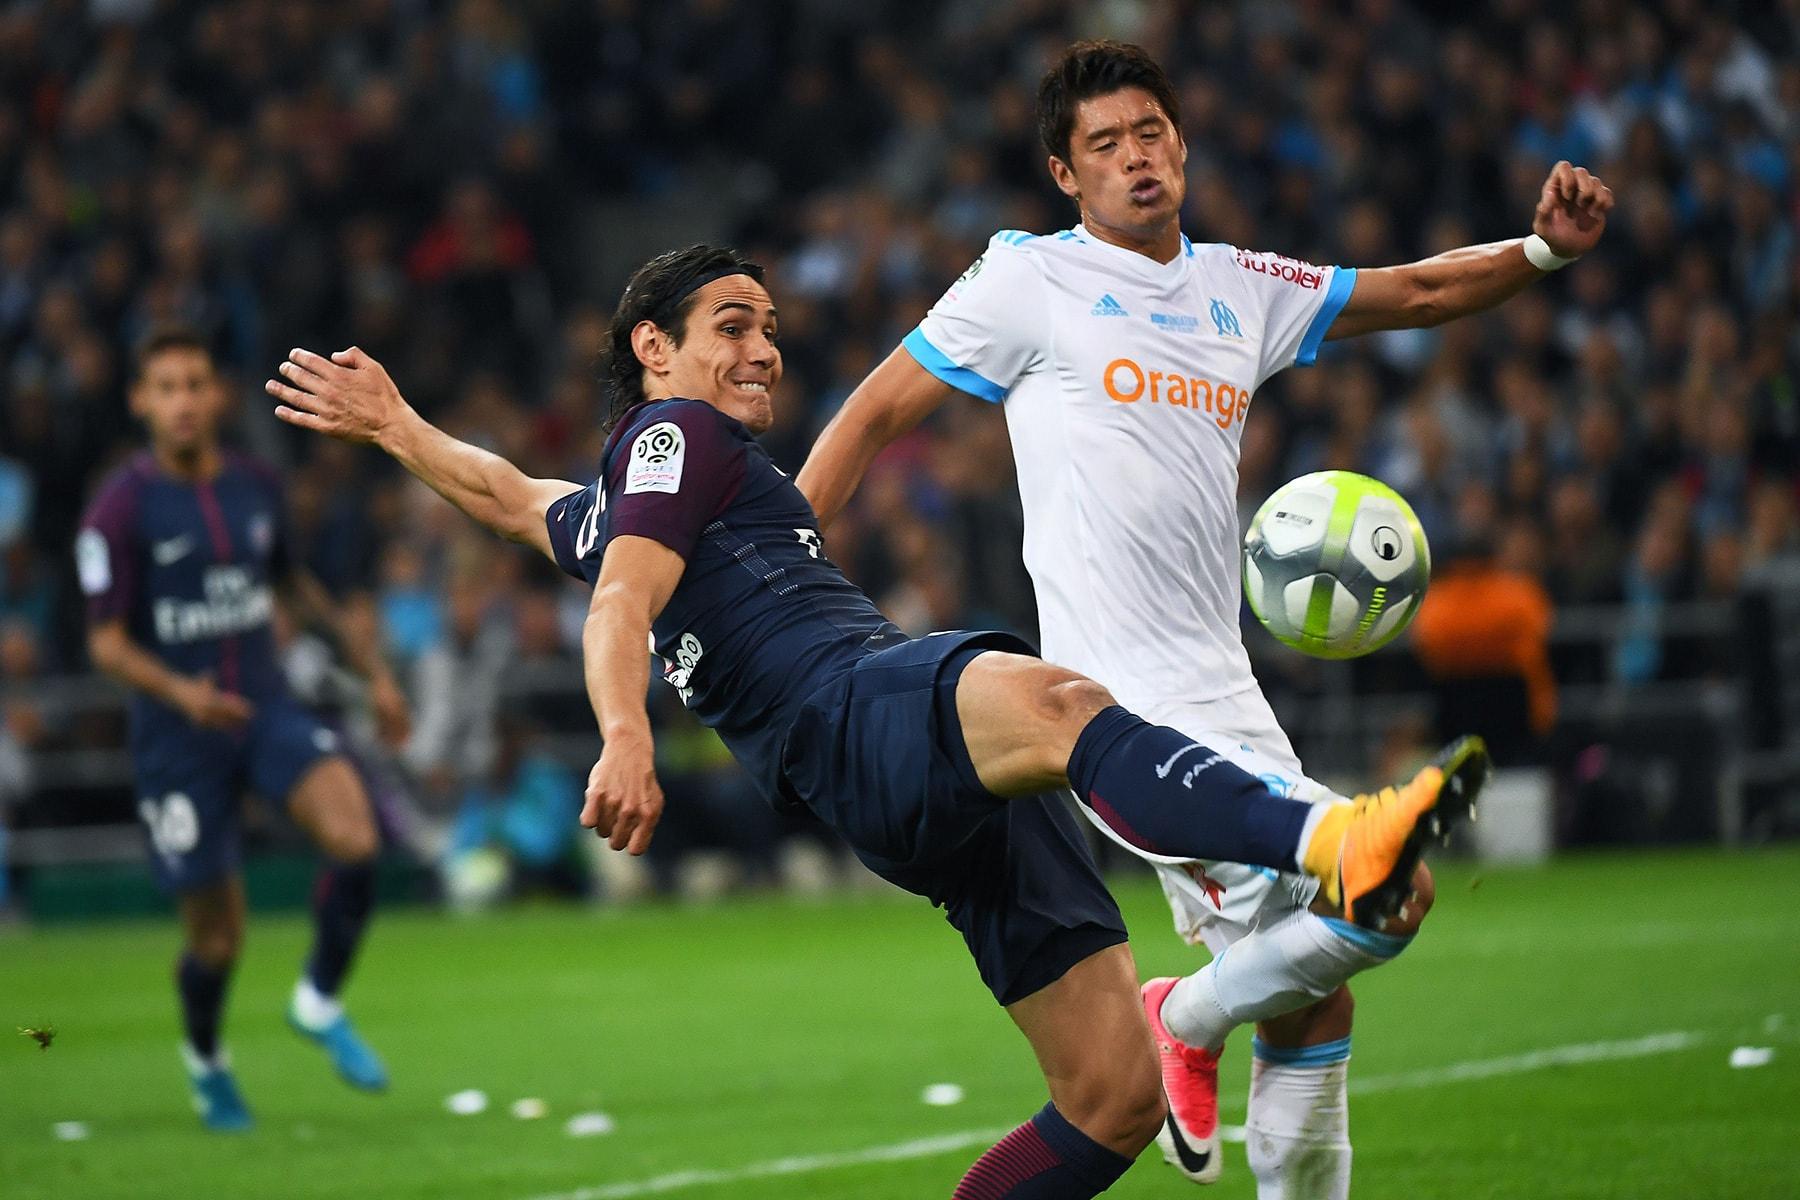 PSG - Marseille Soccer Prediction